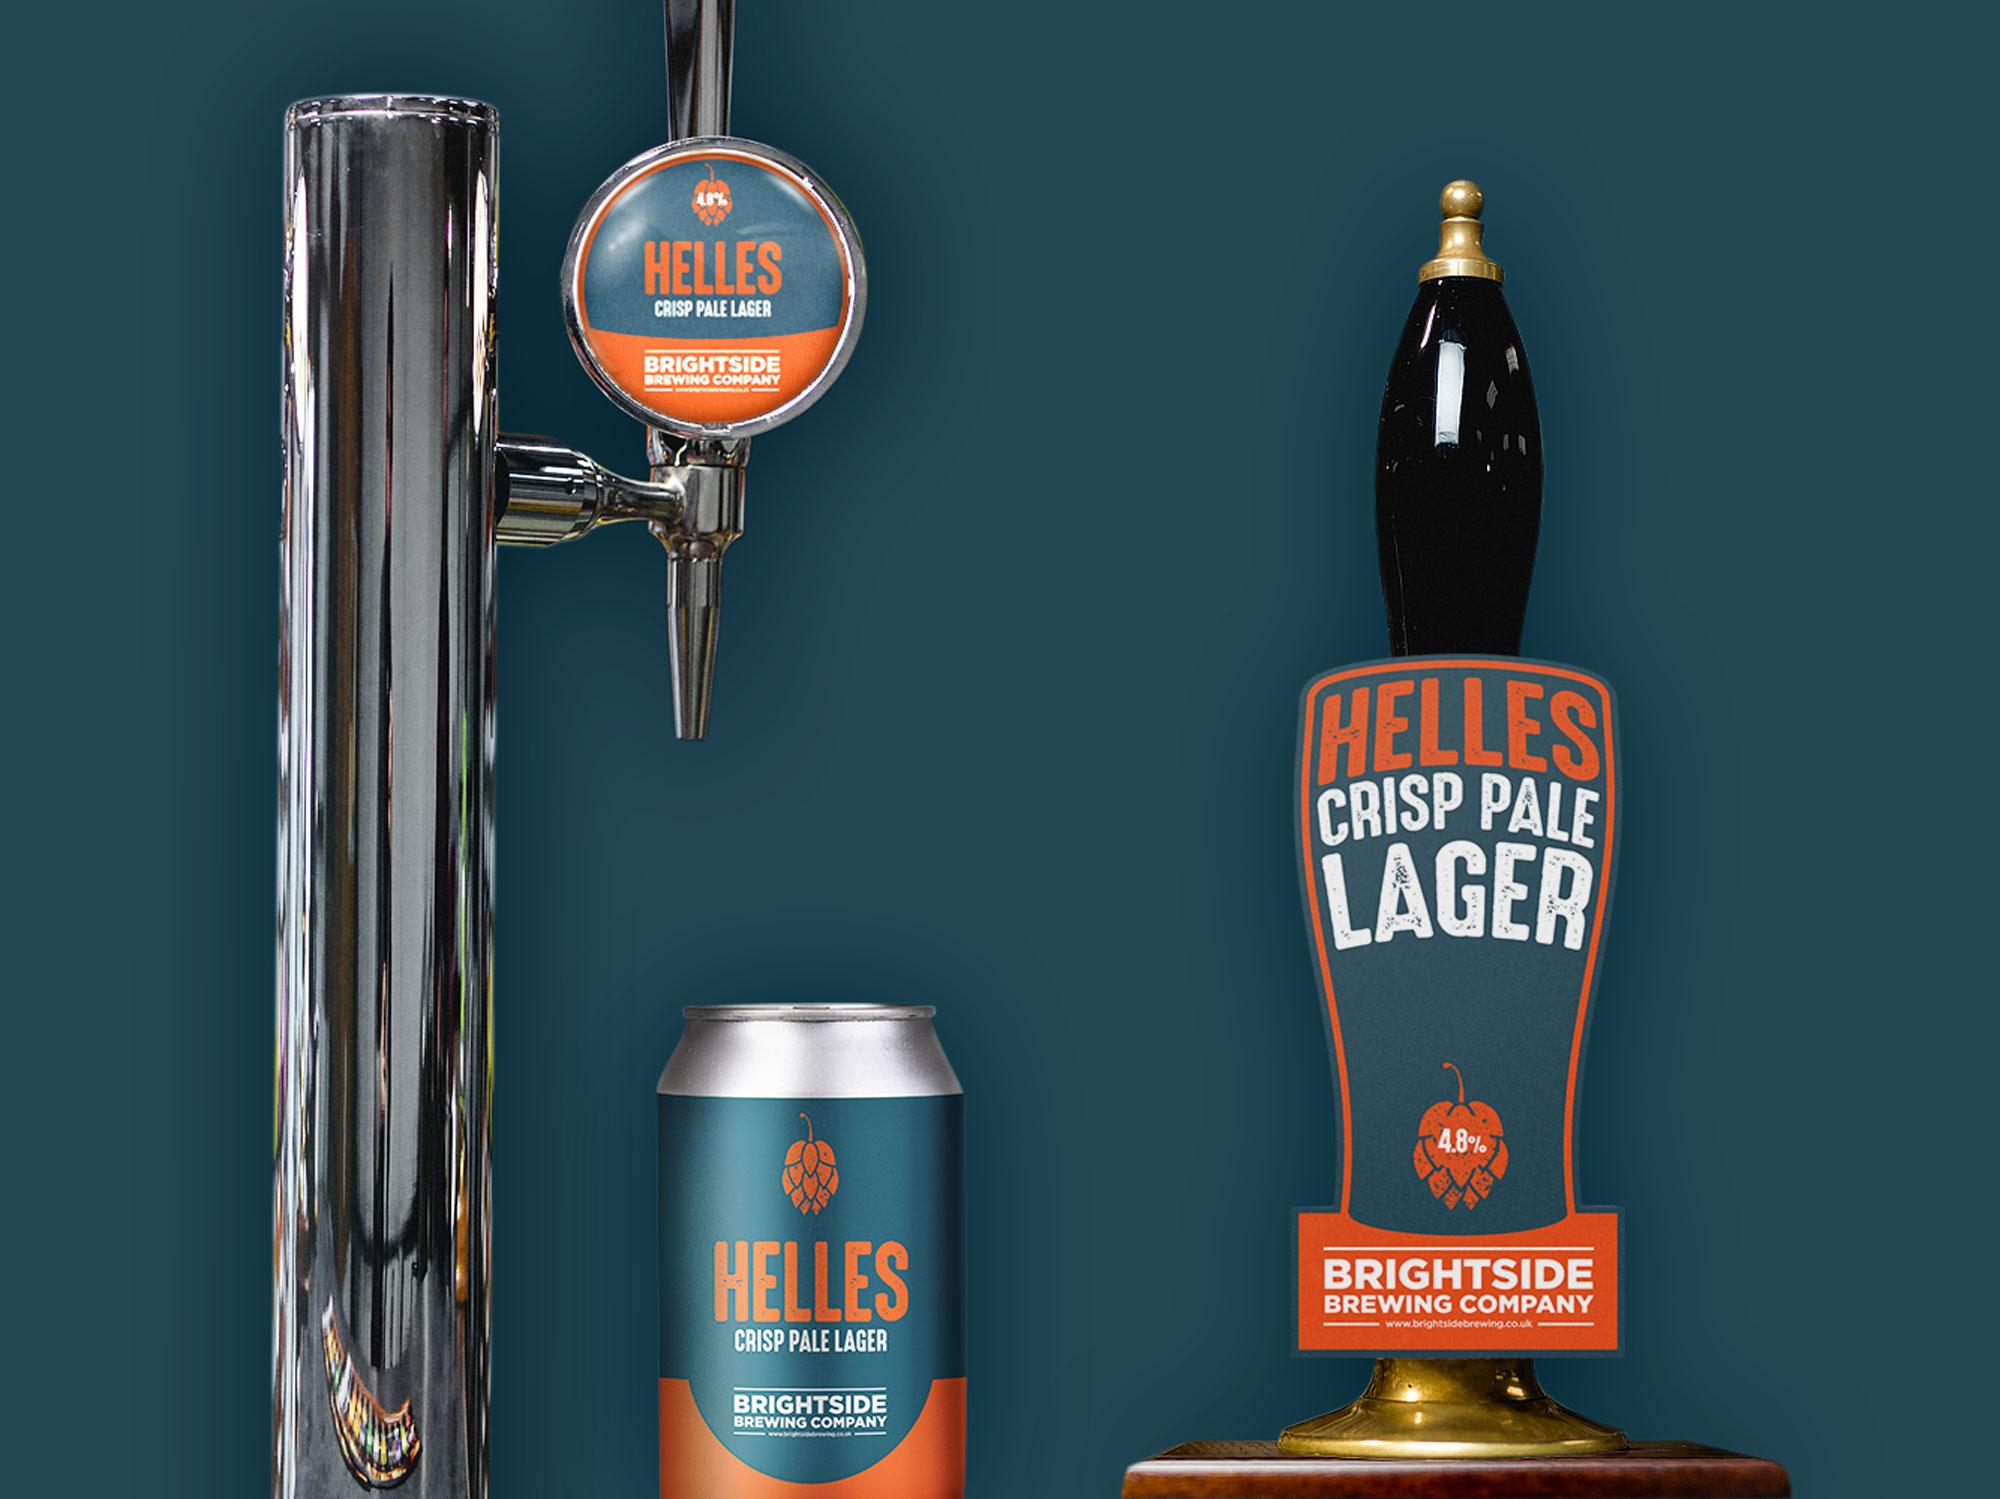 helles-lager_keg-can-cask-photographic.jpg